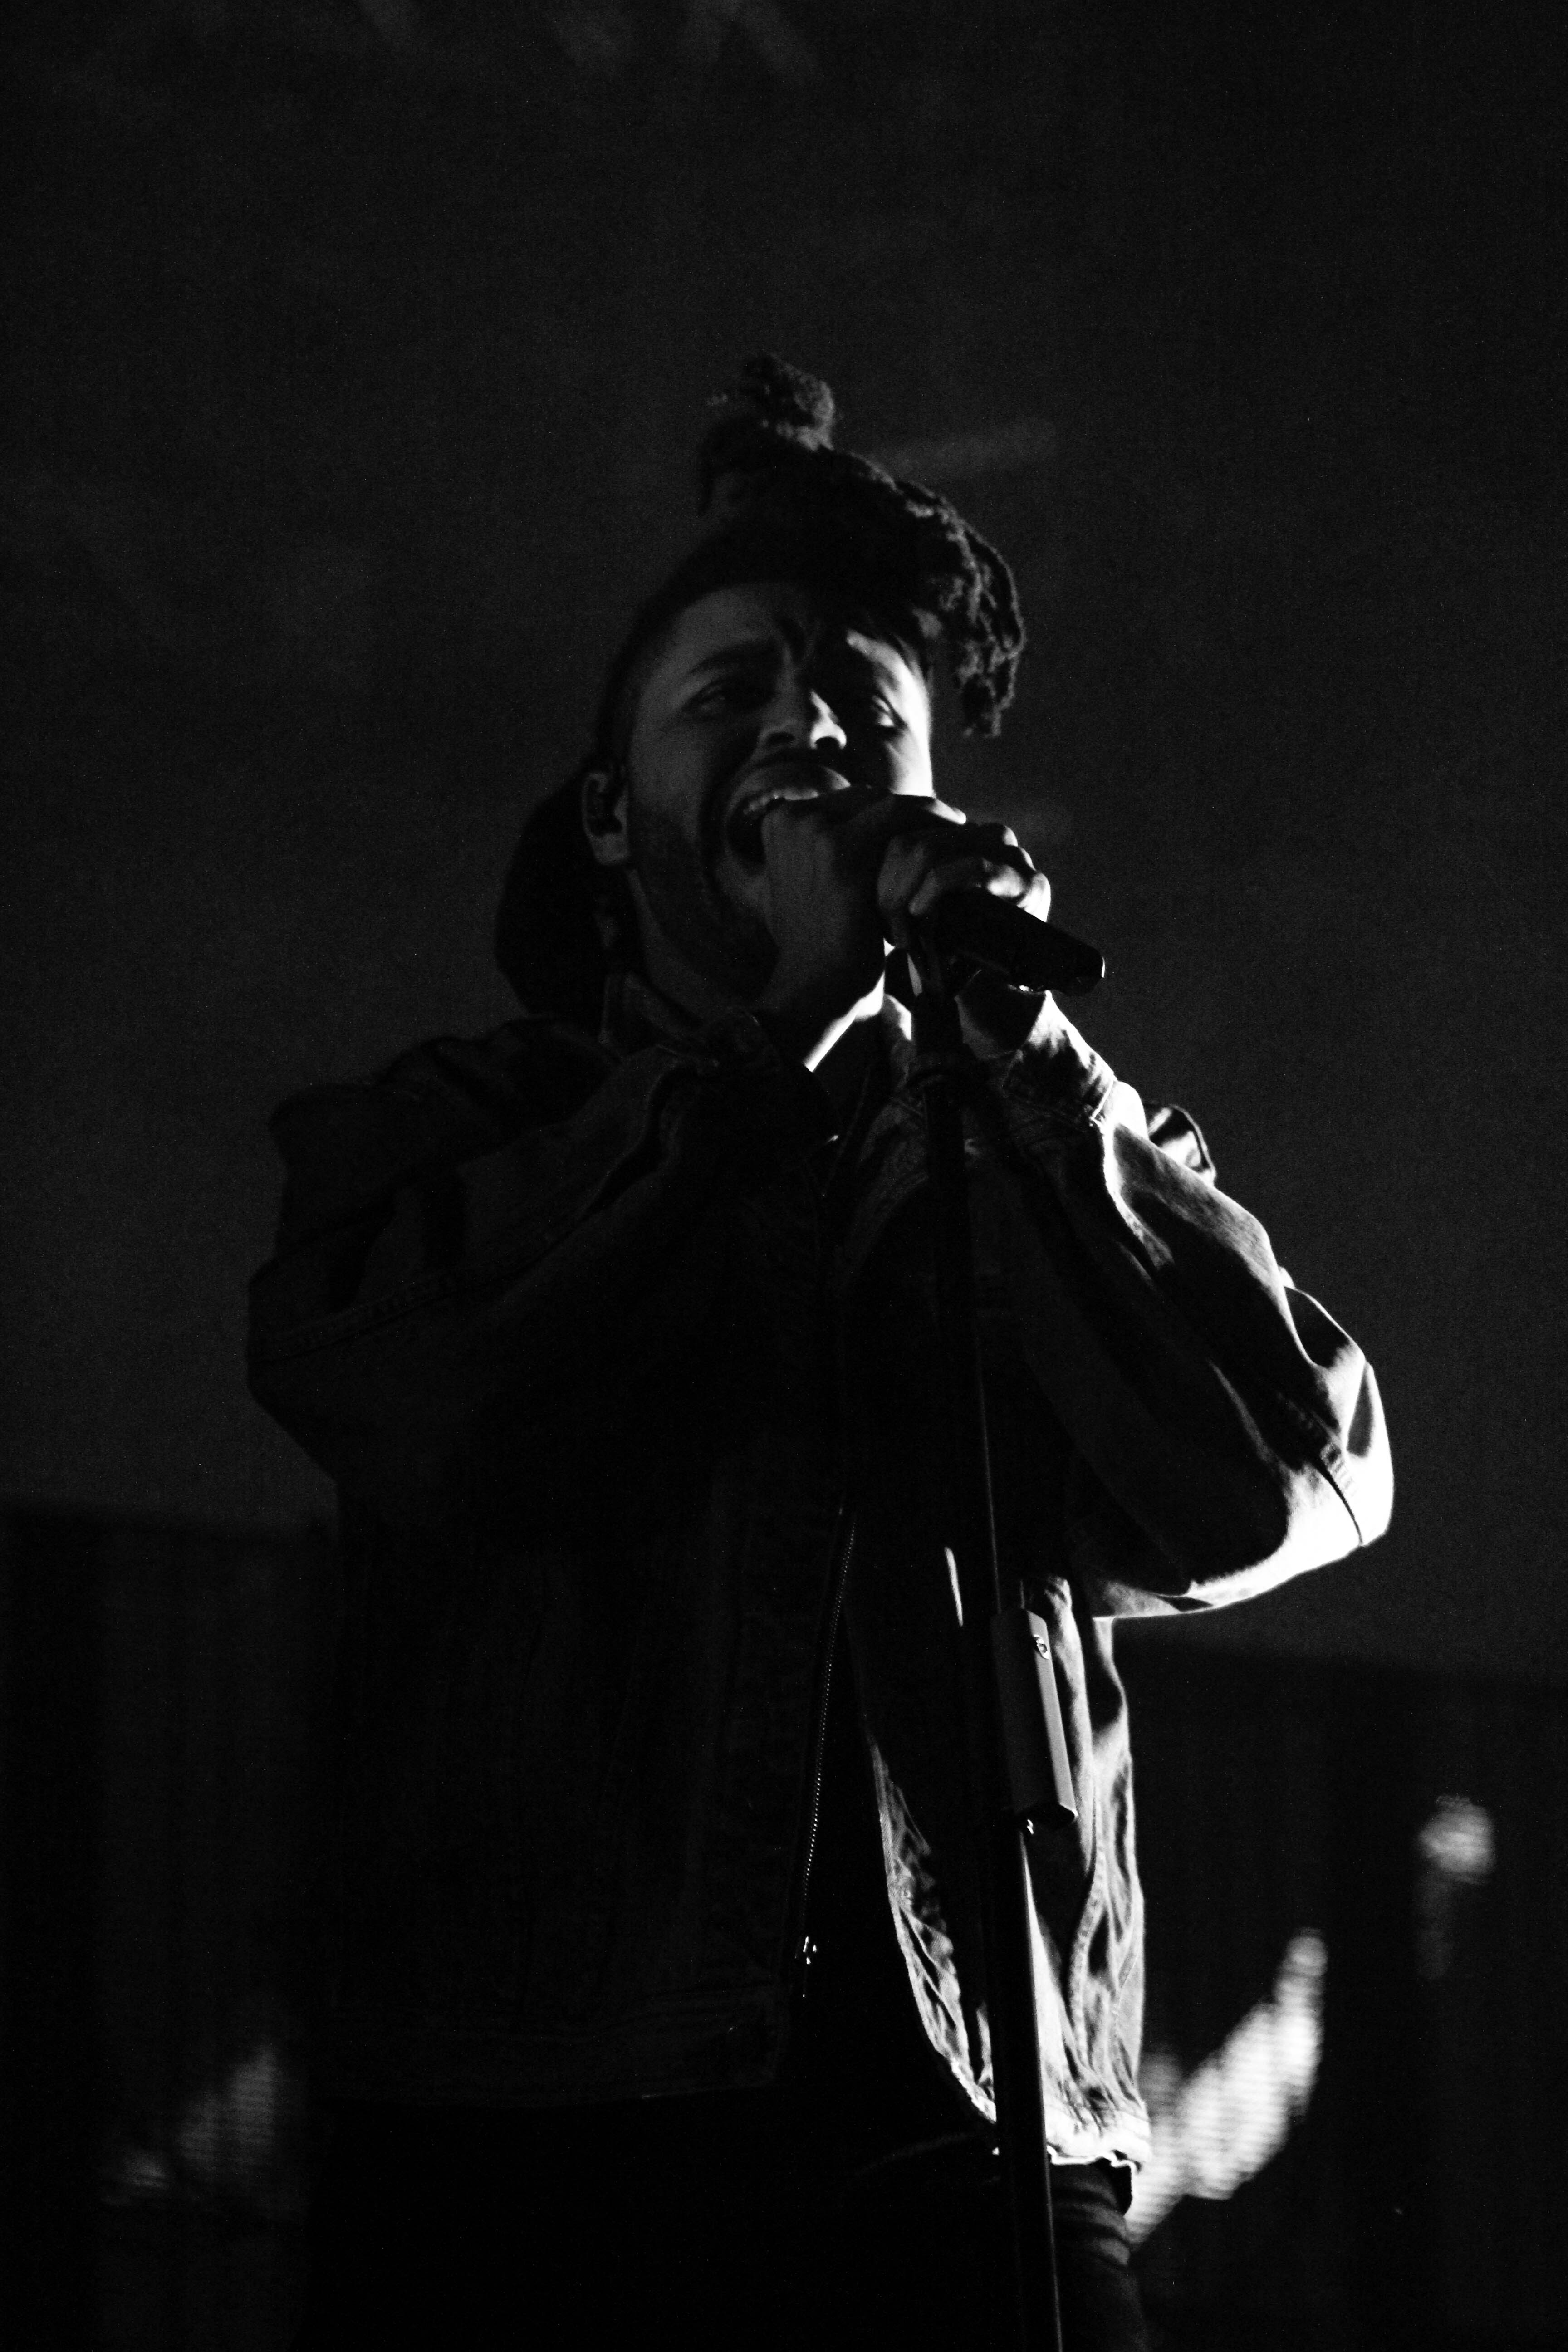 The Weeknd (Ontario, Canada)